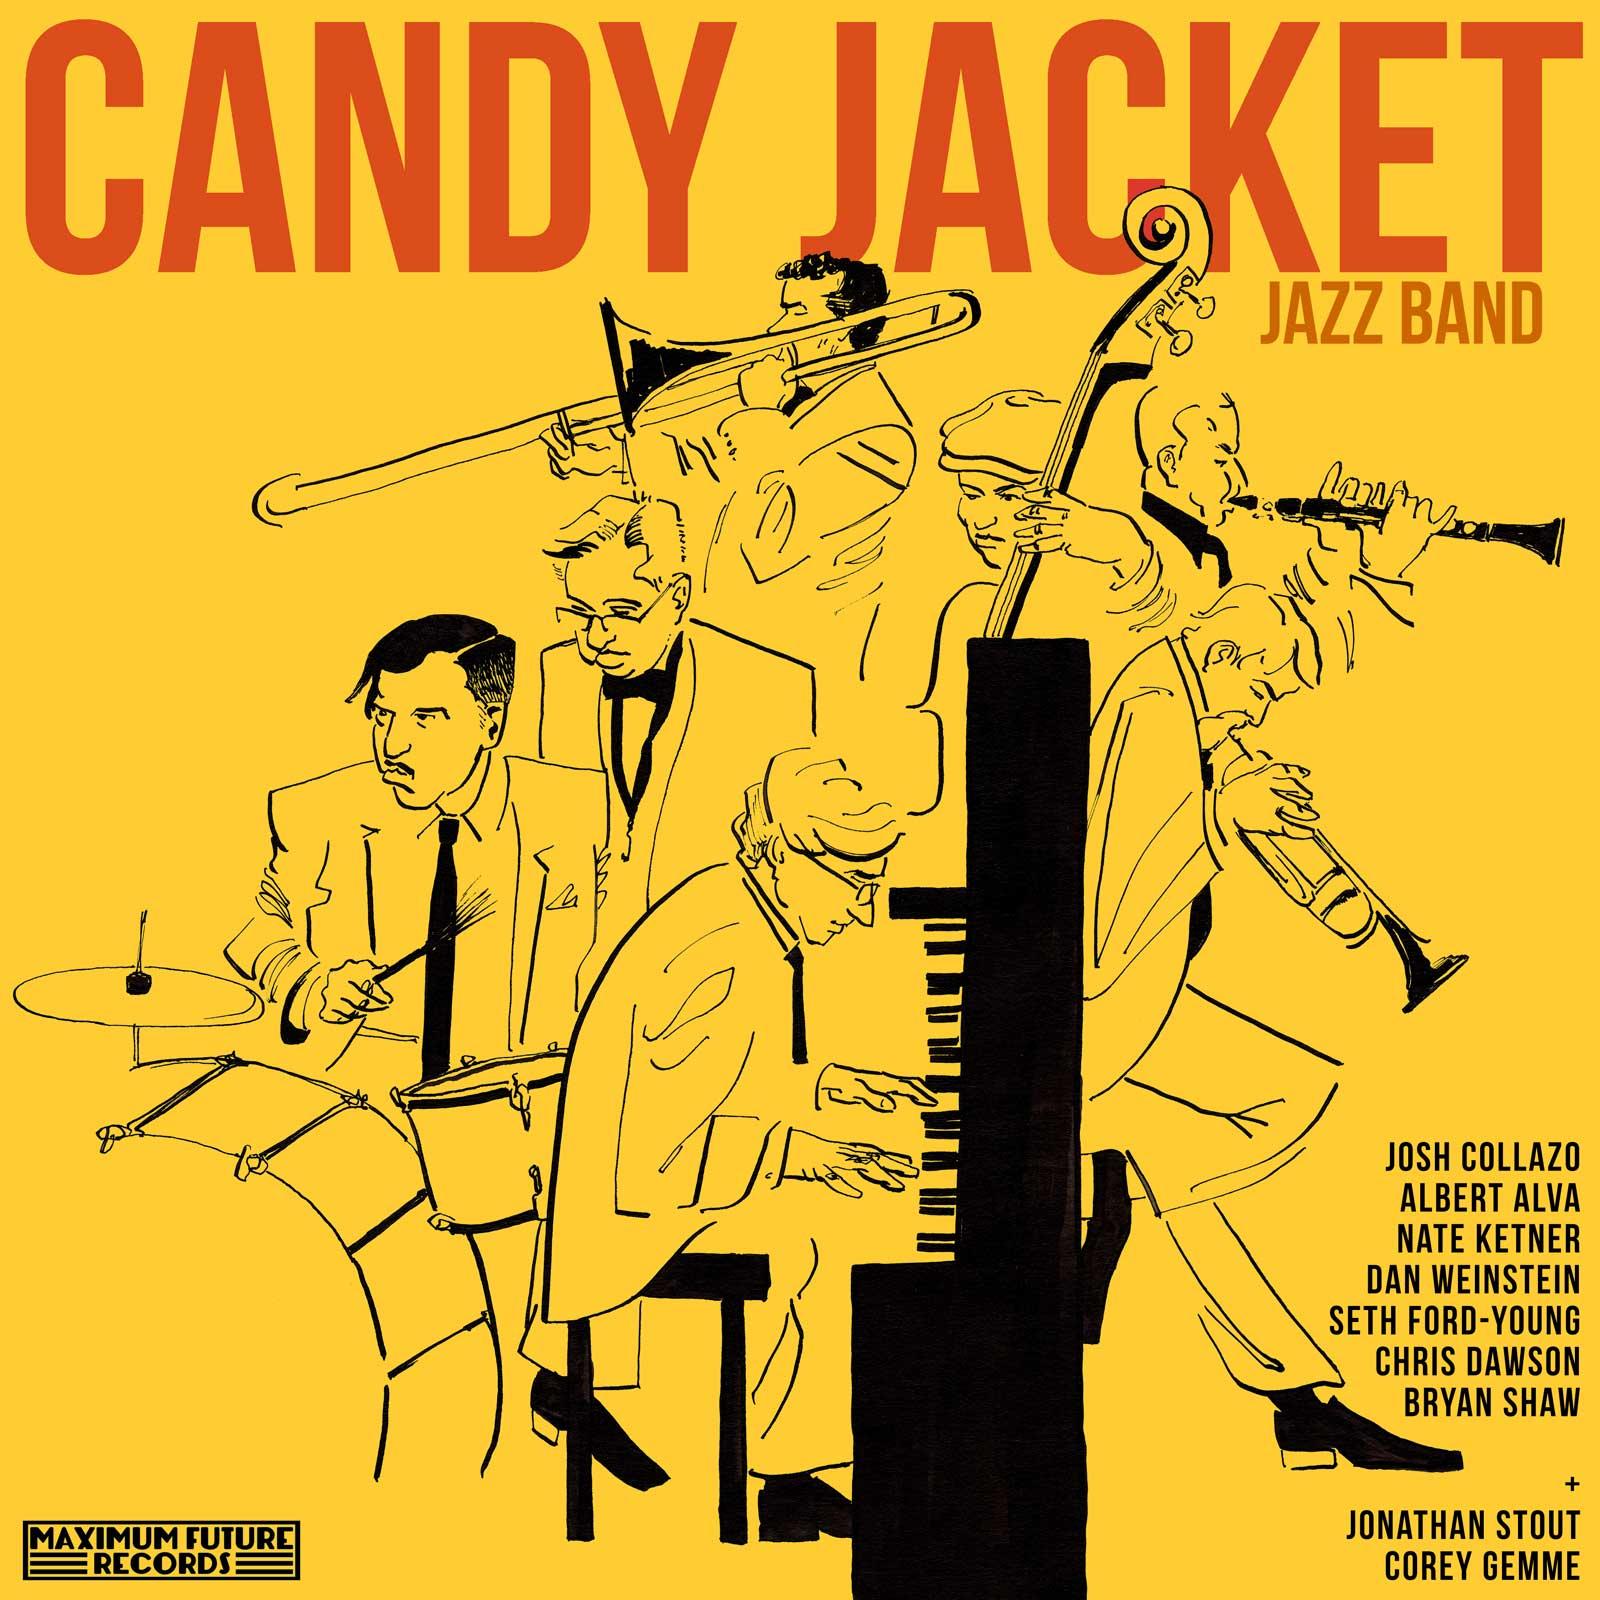 Candy Jacket Jazz Band Final Album CoverDesign